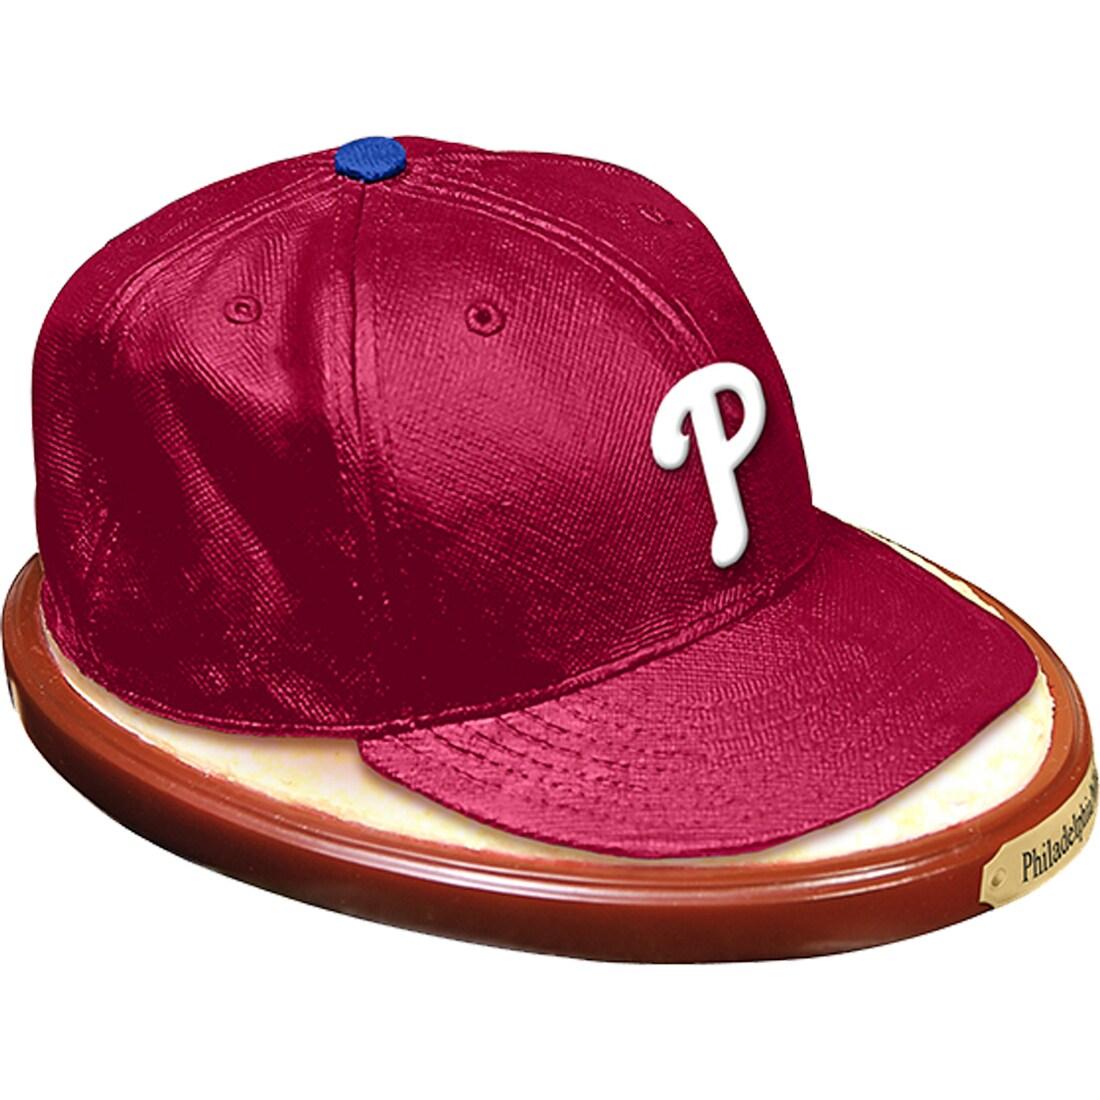 Philadelphia Phillies Desk Replica MLB Cap